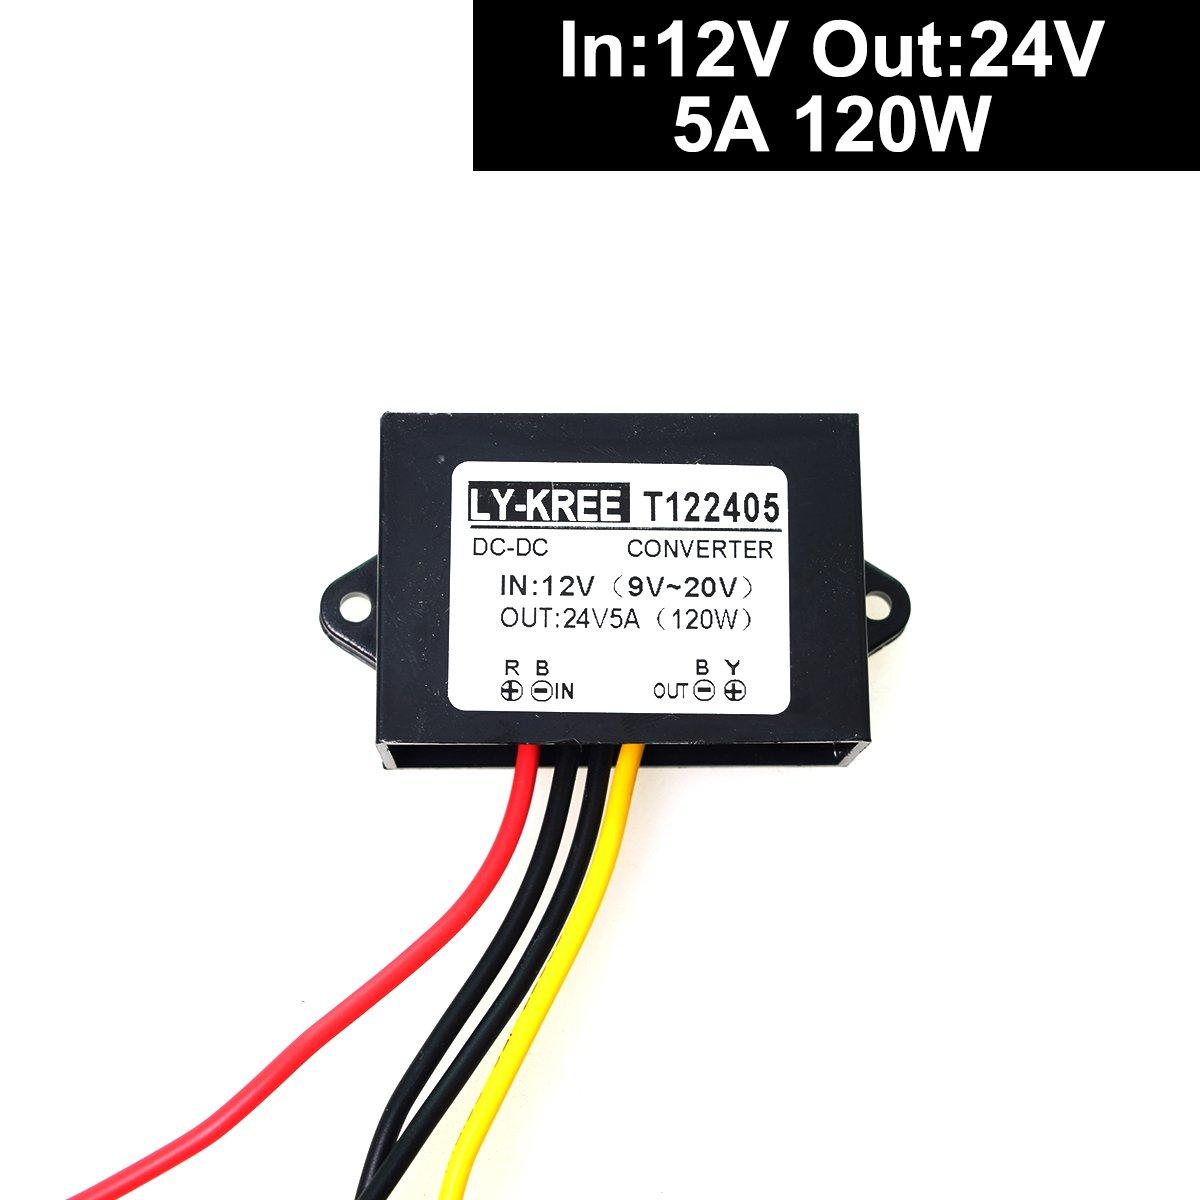 DC 12v Step up to 24v Converter Regulator 5A 120W Power Supply Adapter for Motor Car Truck Vehicle Boat Solar System etc.(Accept DC9-20V Inputs)